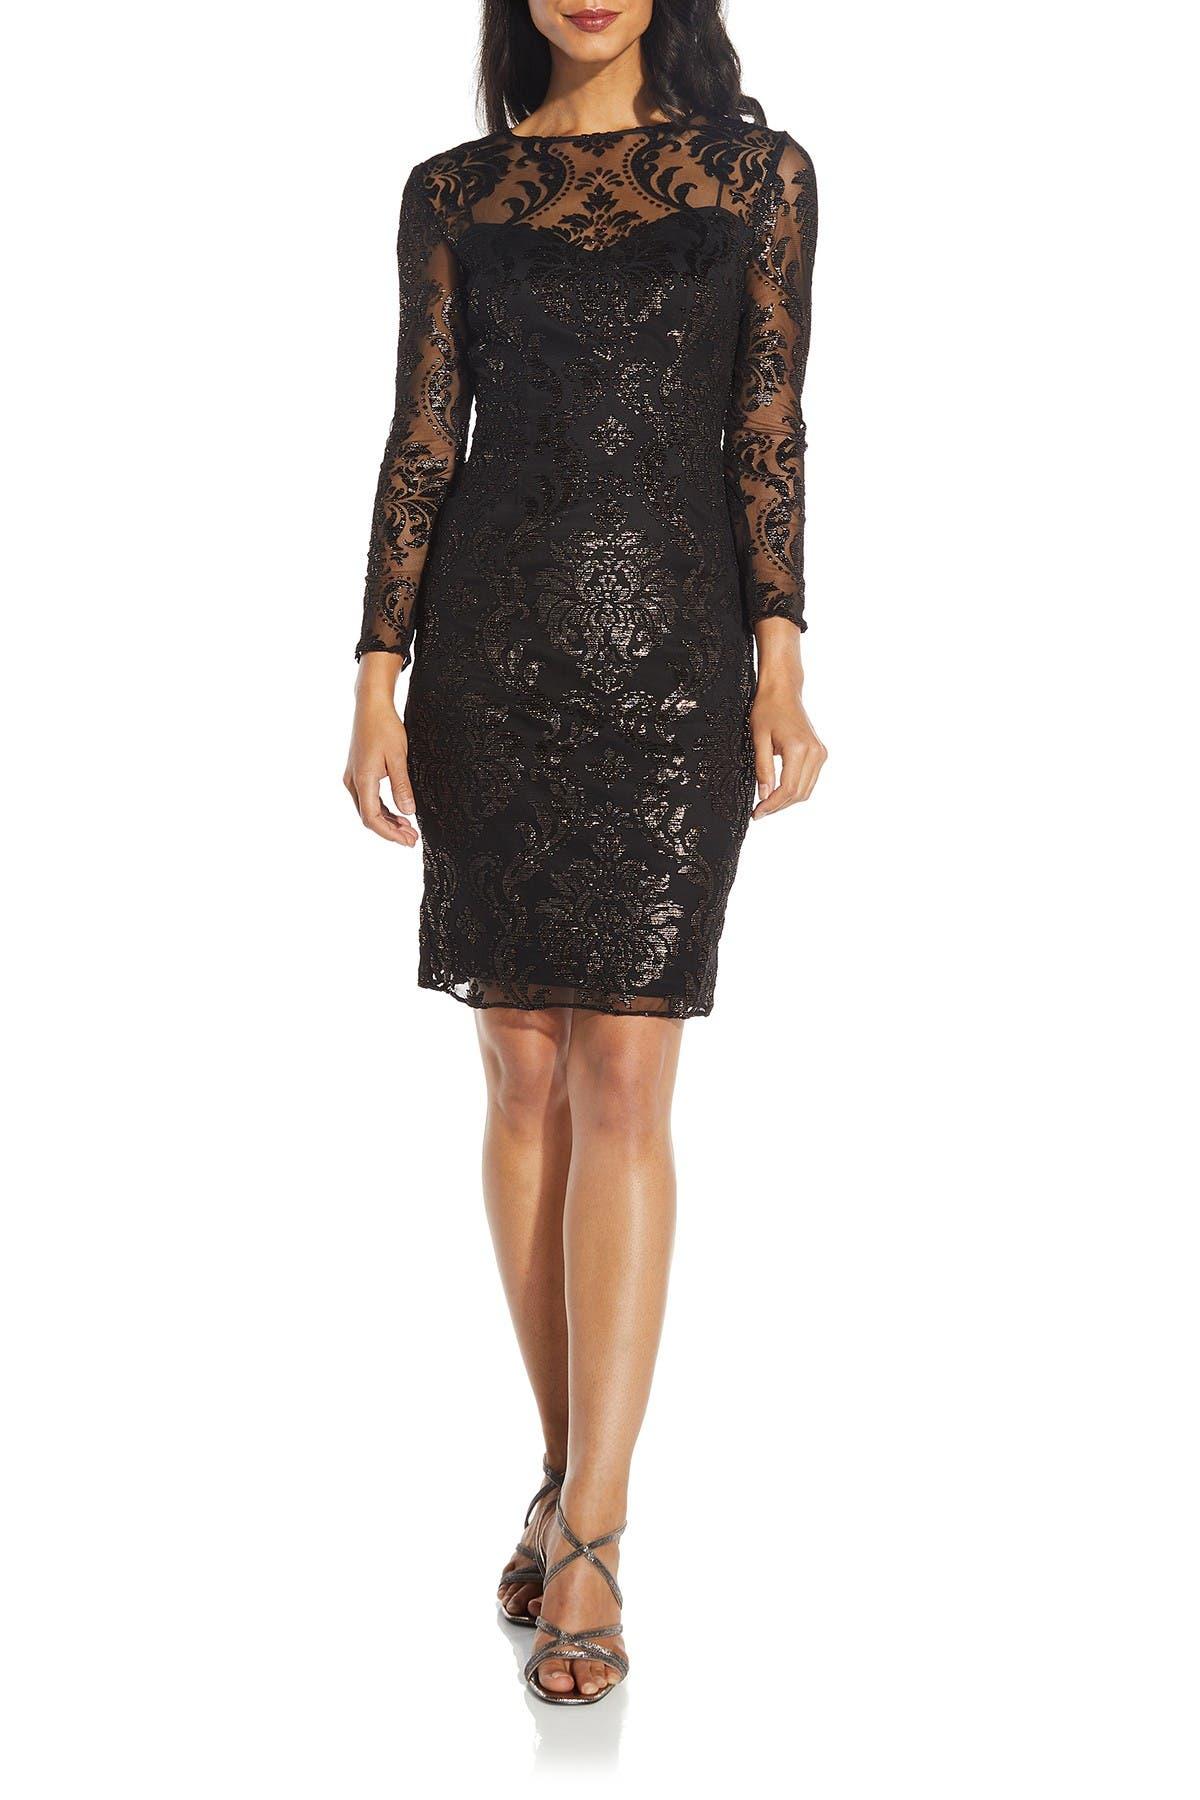 Image of Adrianna Papell Burnout Emblem Dress